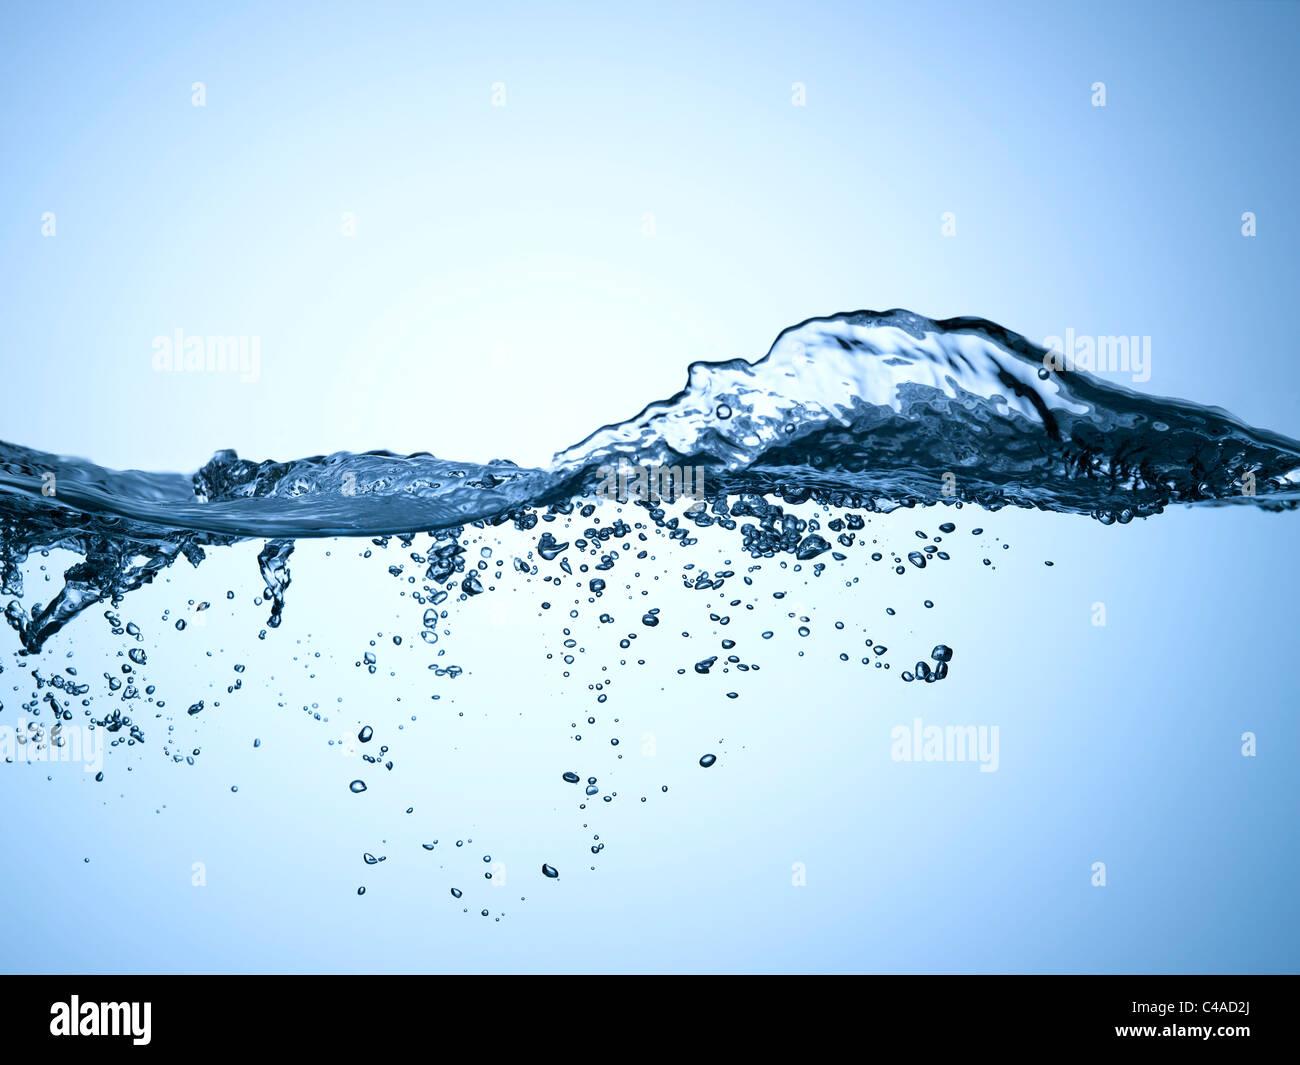 Water movement - Stock Image